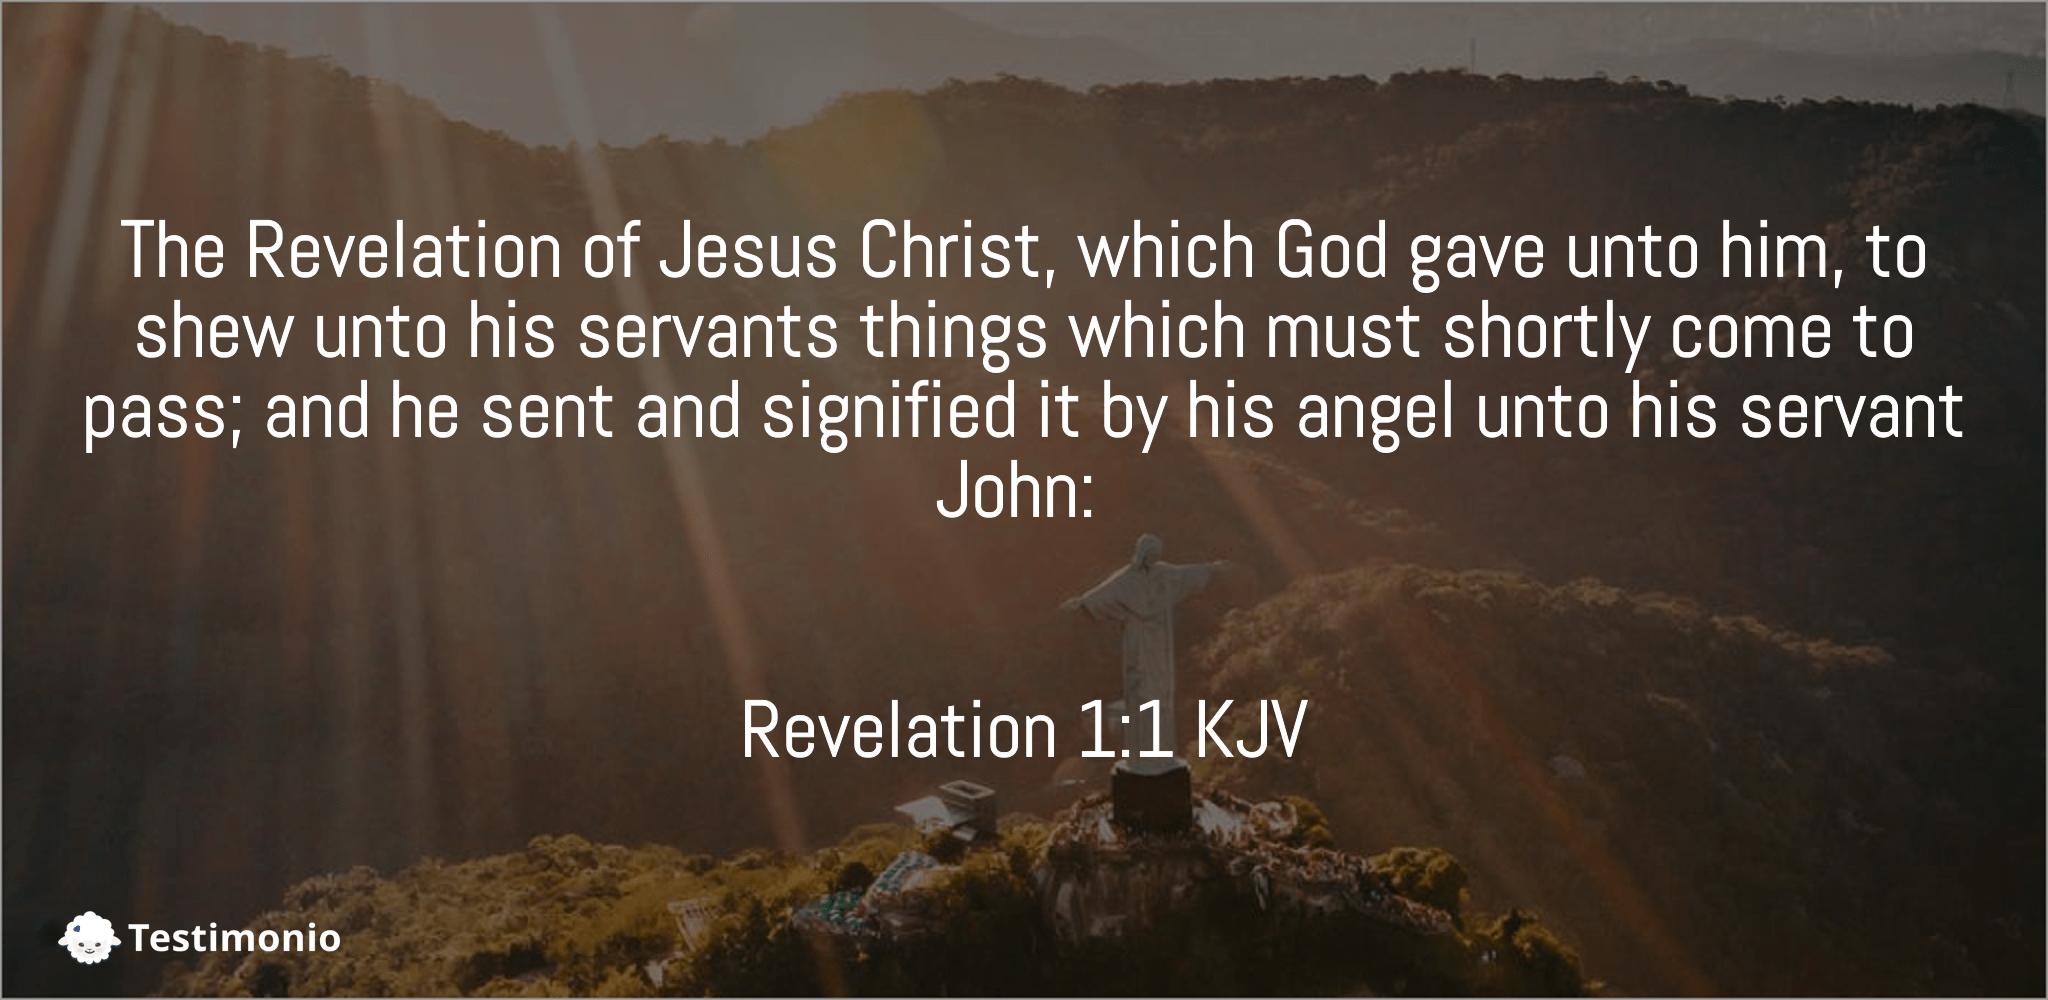 Revelation 1:1